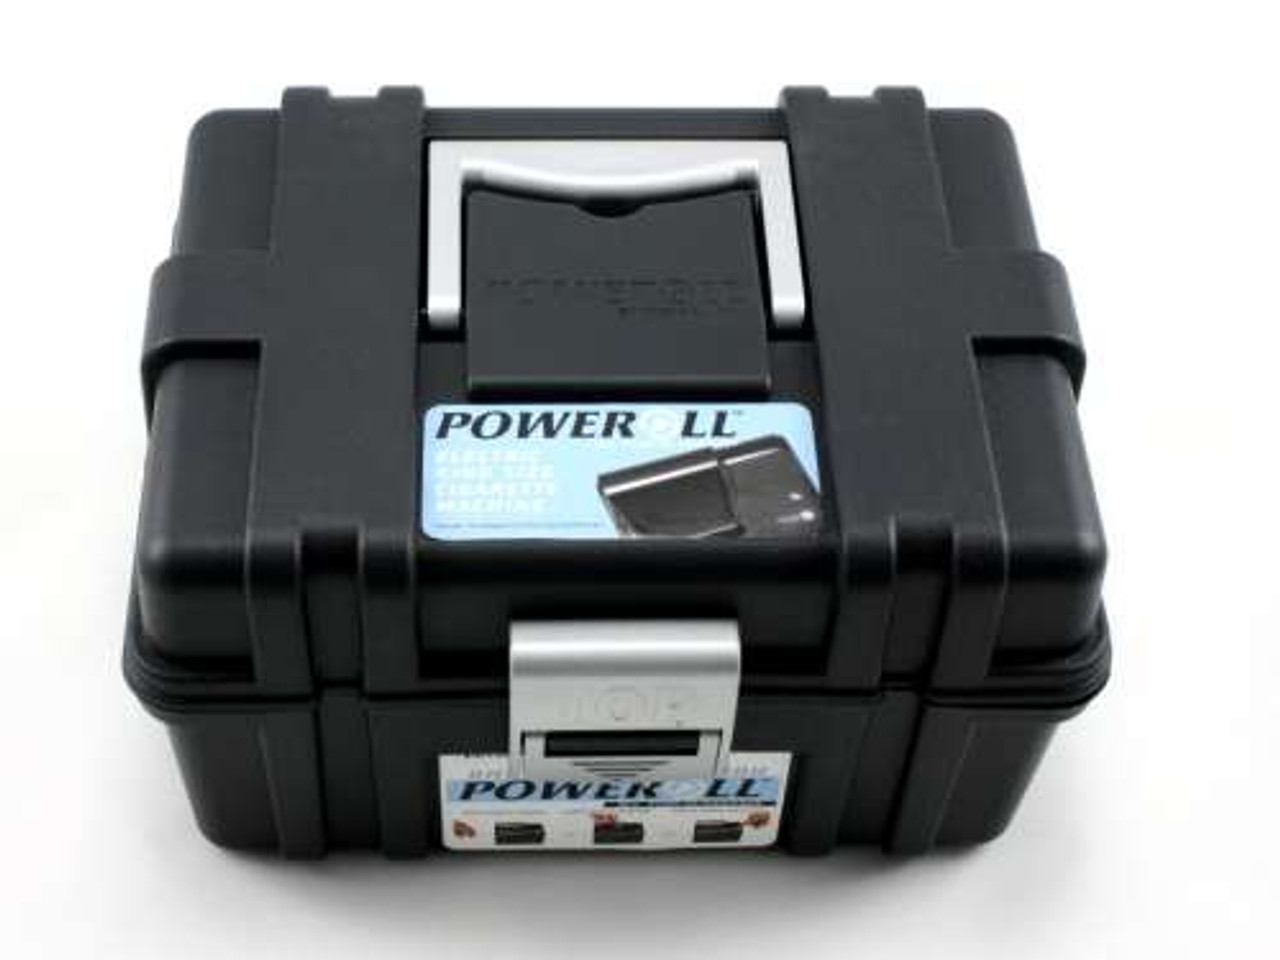 Poweroll Electric Cigarette Rolling Machine